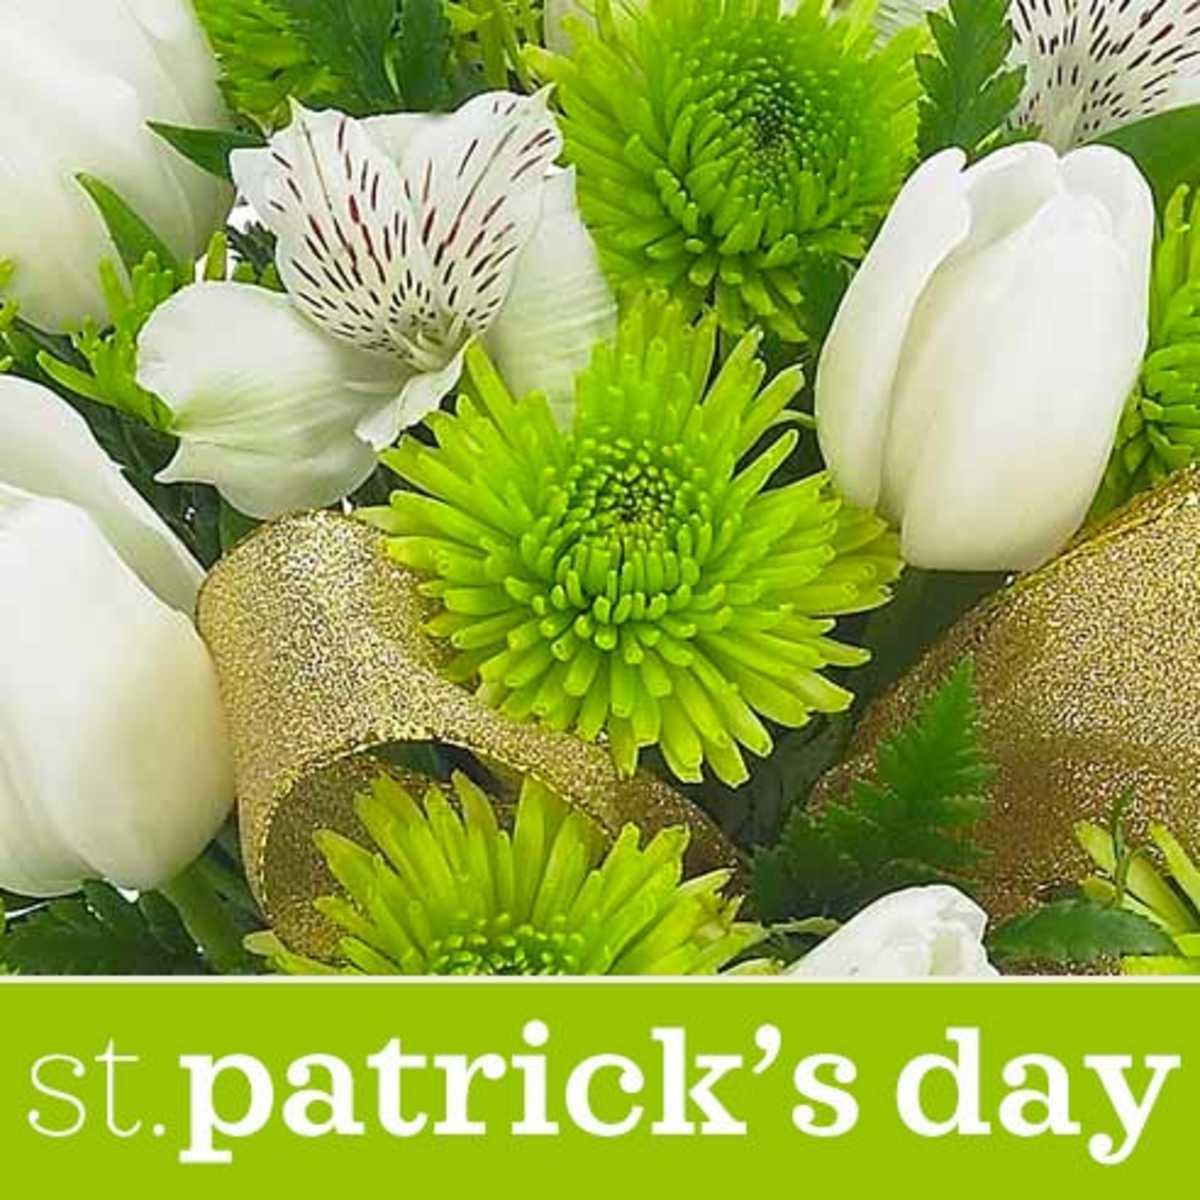 more-aphorisms-of-sri-chinmoy-happy-st-patricks-day